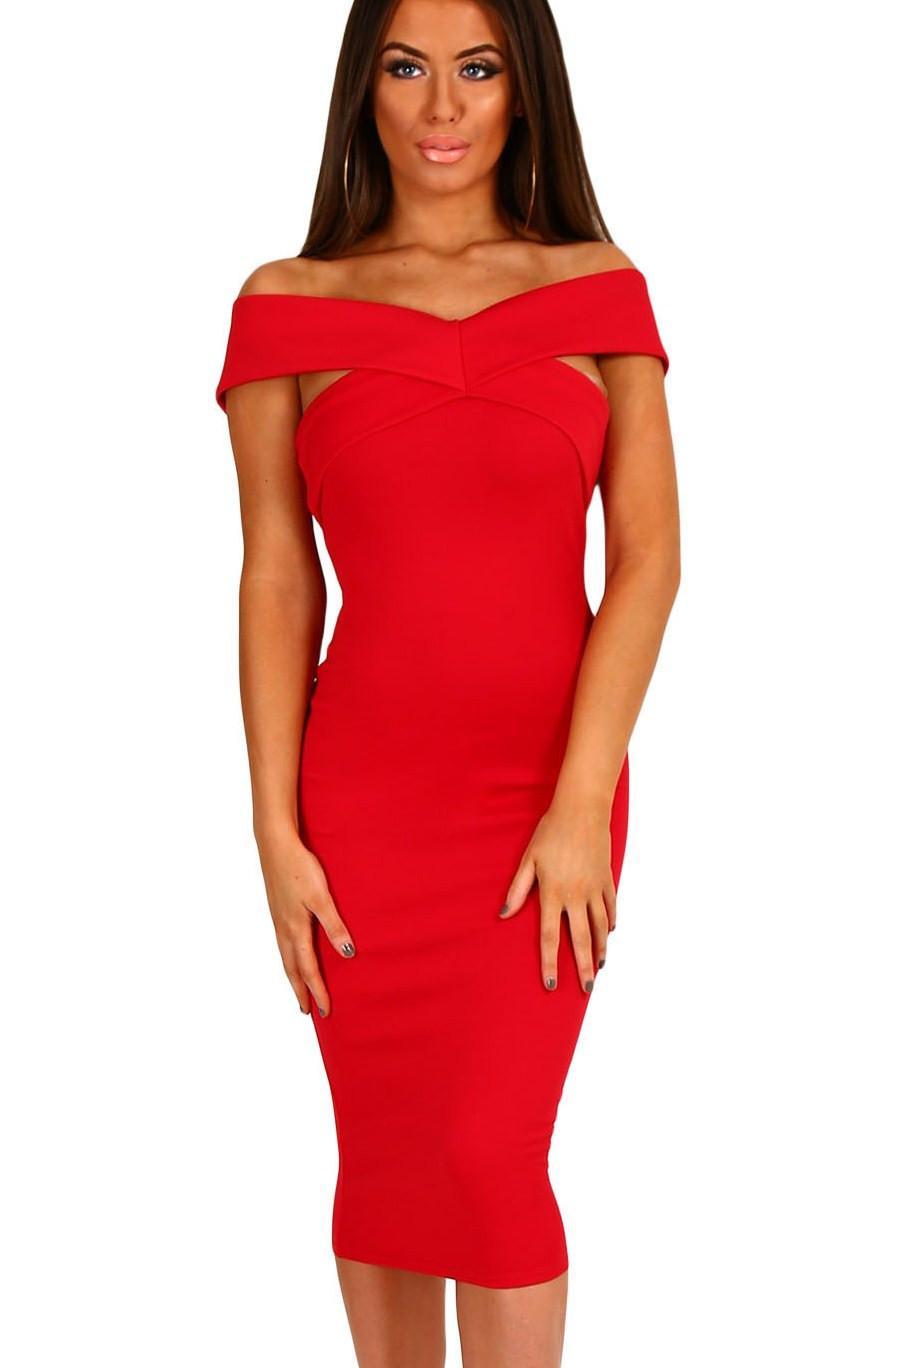 Robe rouge moulante